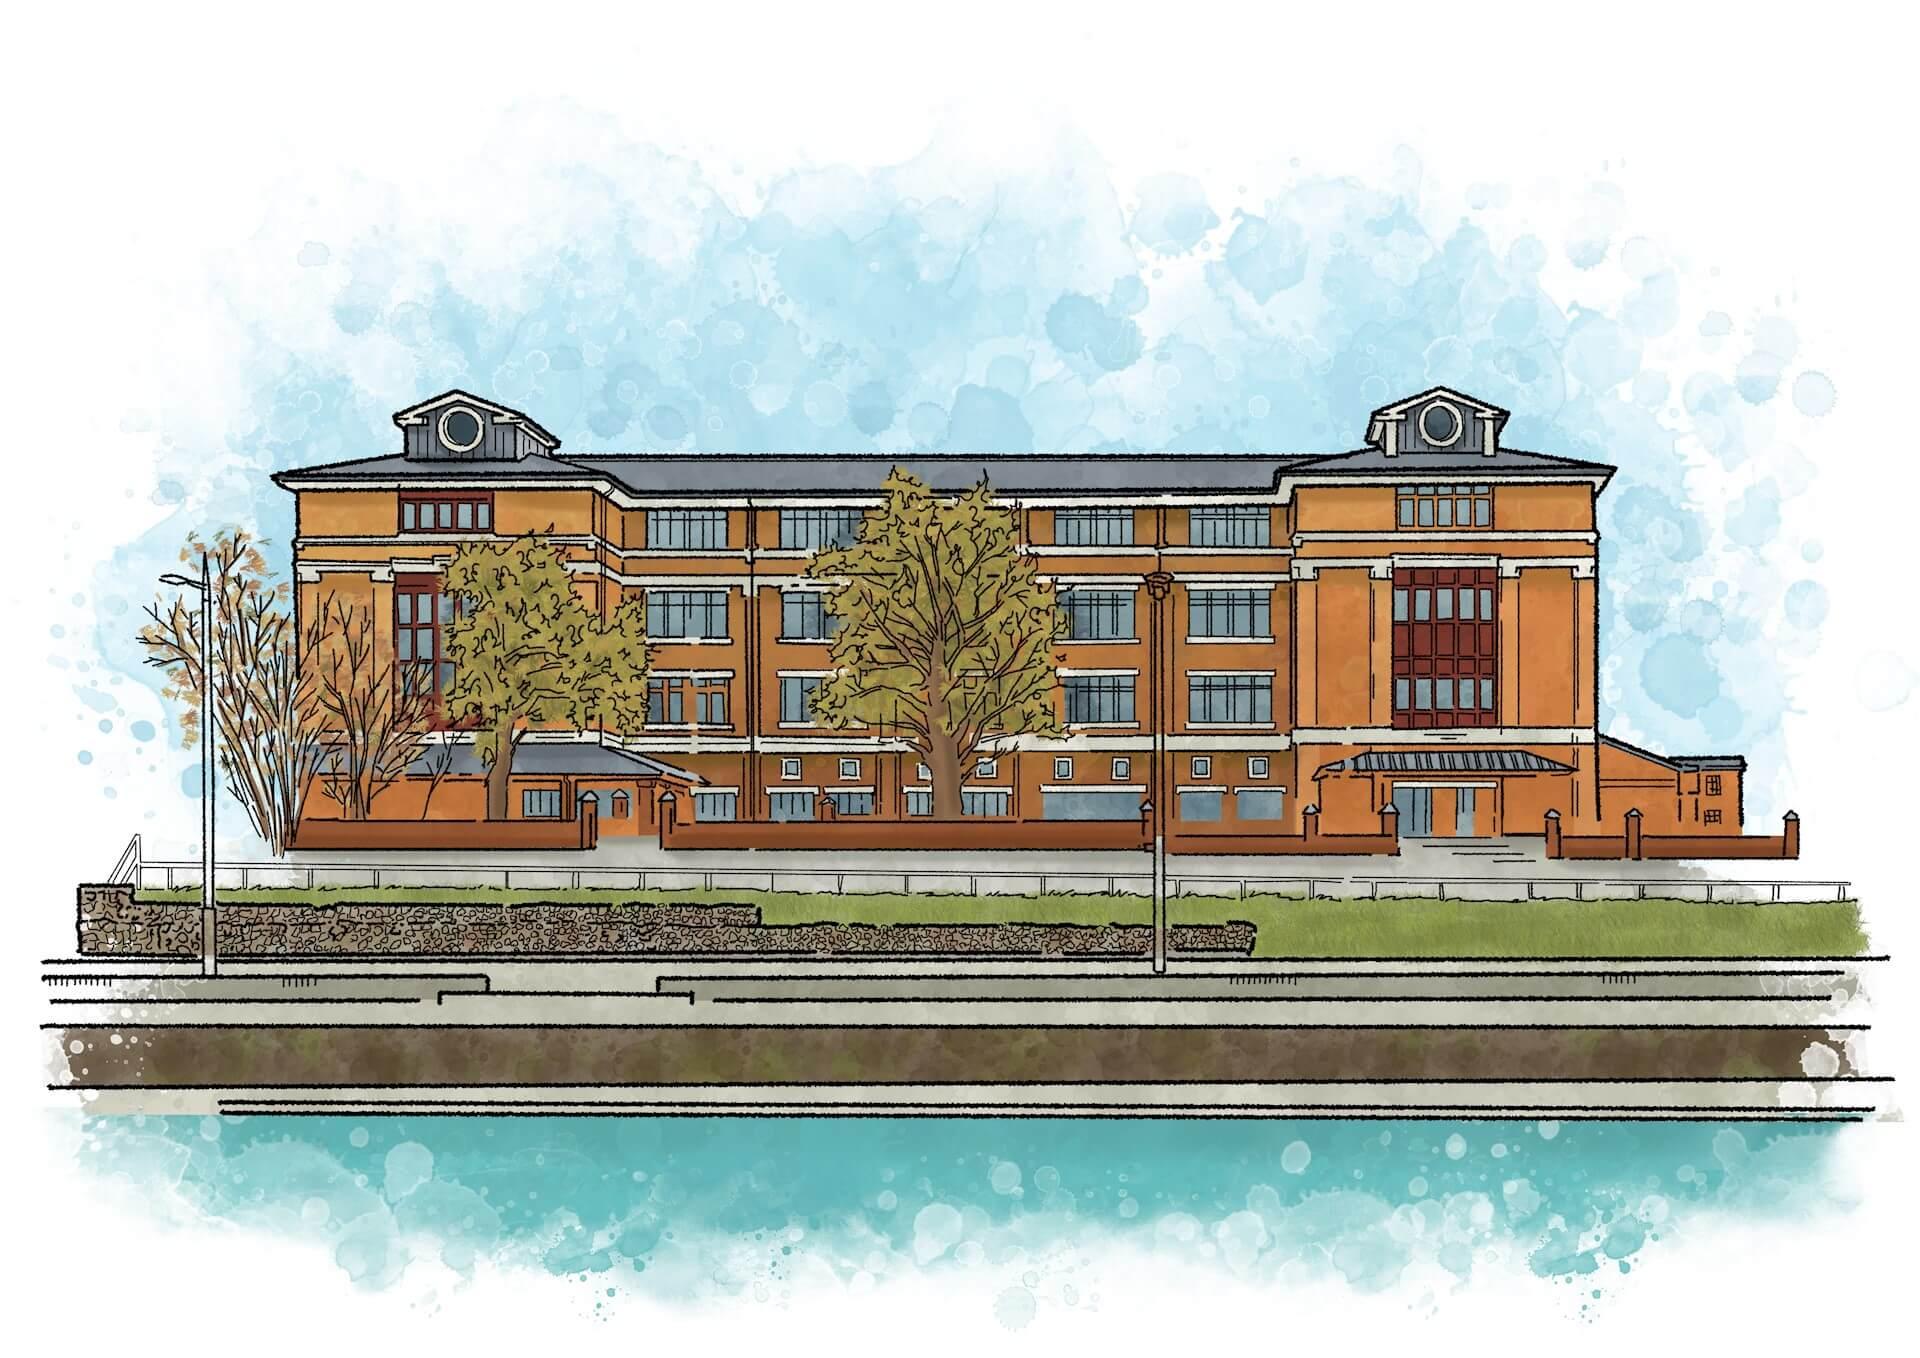 Artist's sketch illustration of Southgate House in Gloucester